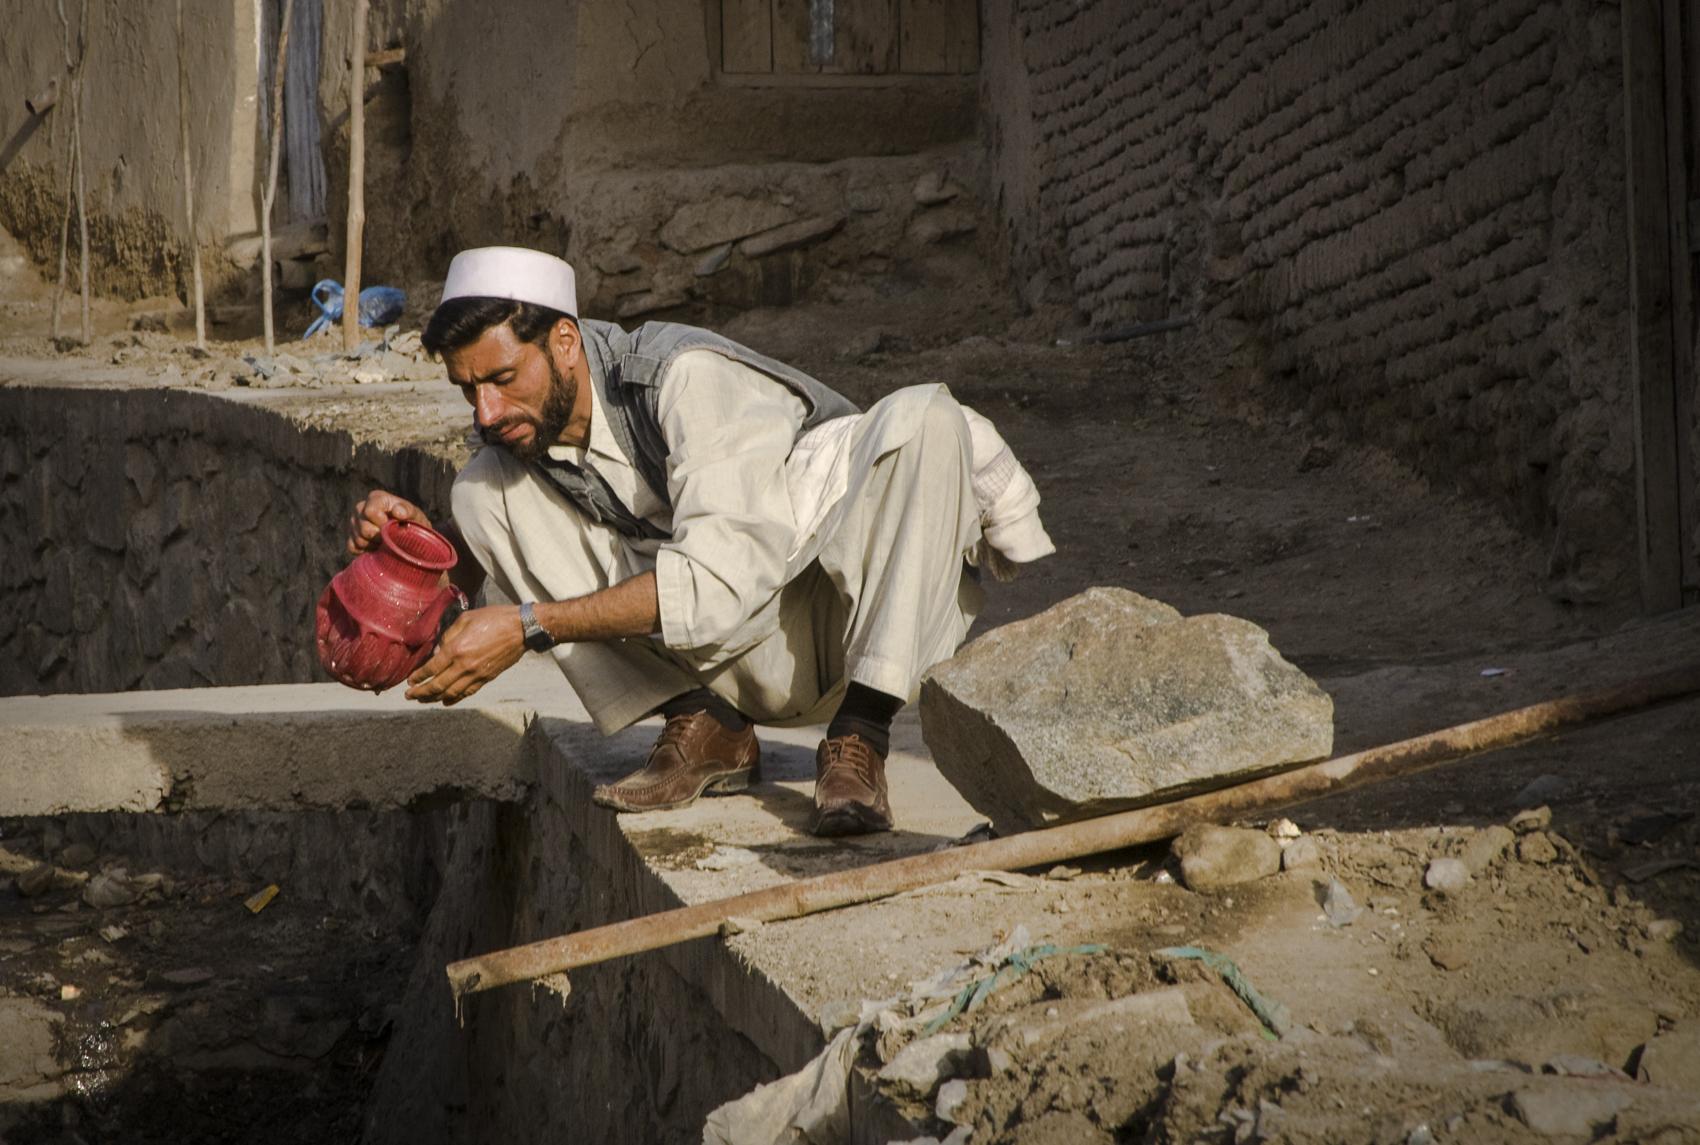 Using street water, Kabul